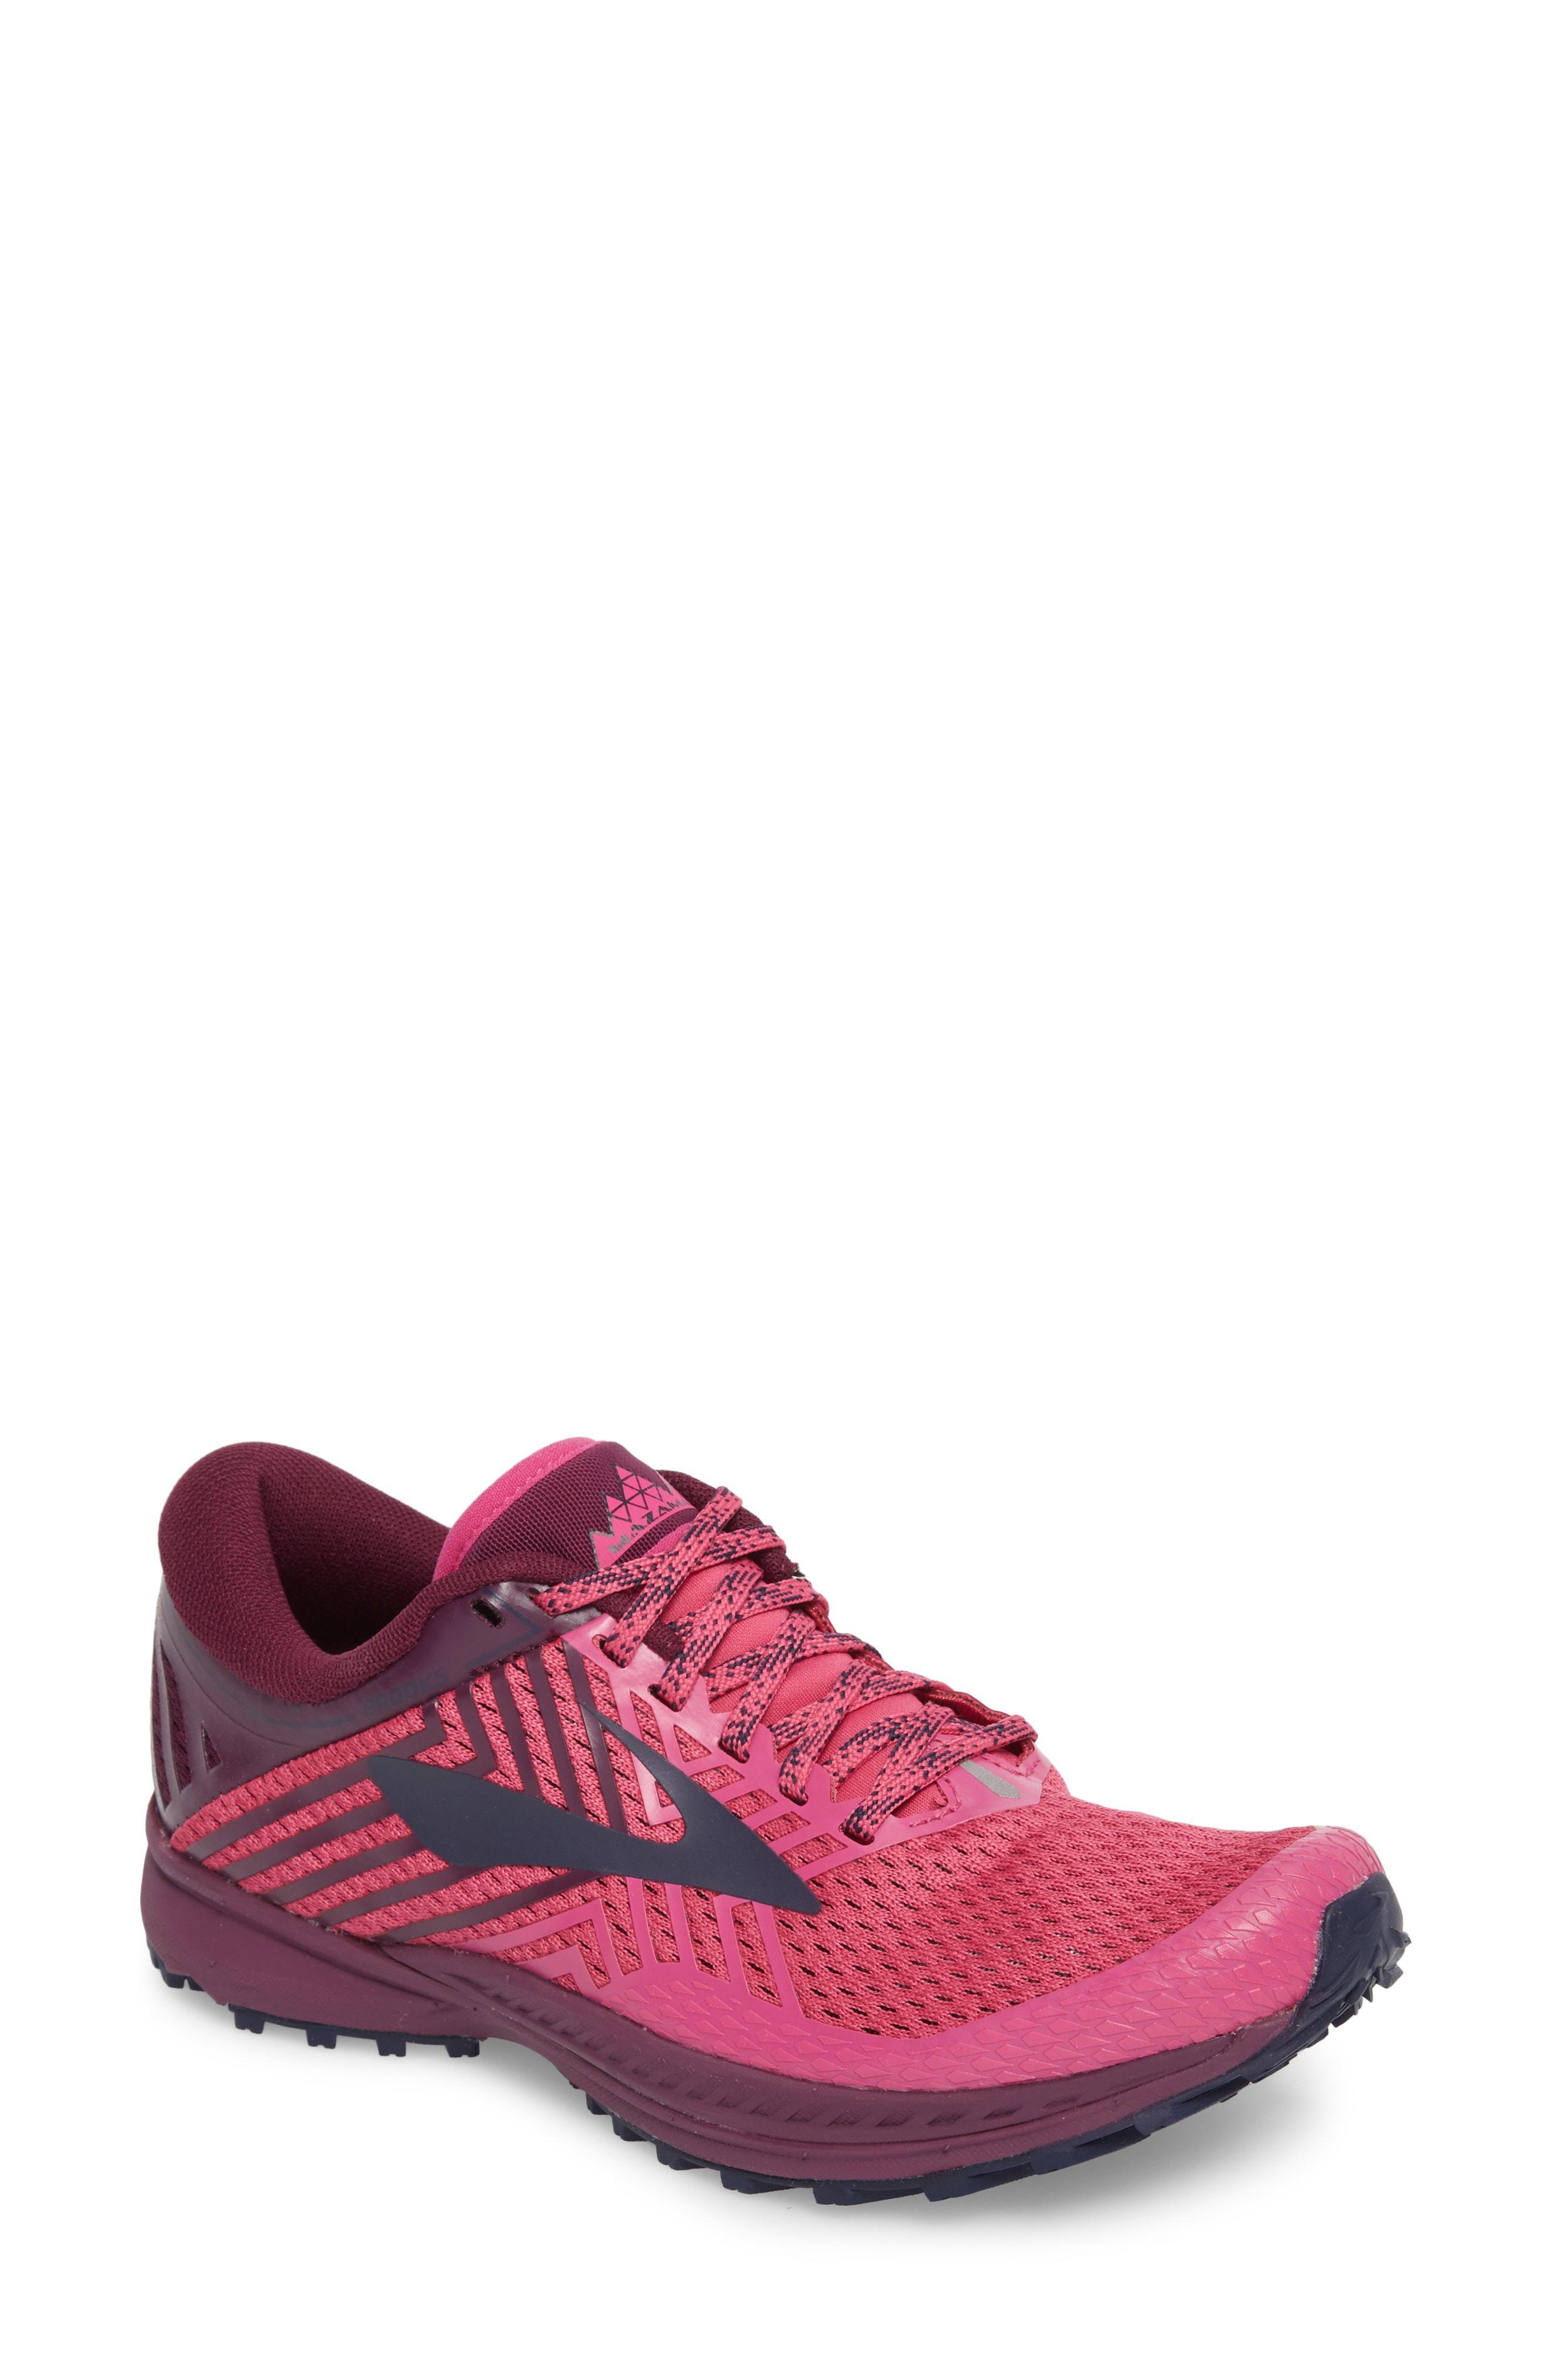 c50cc803ff8 Brooks Mazama 2 Trail Running Shoe In Pink Plum Navy